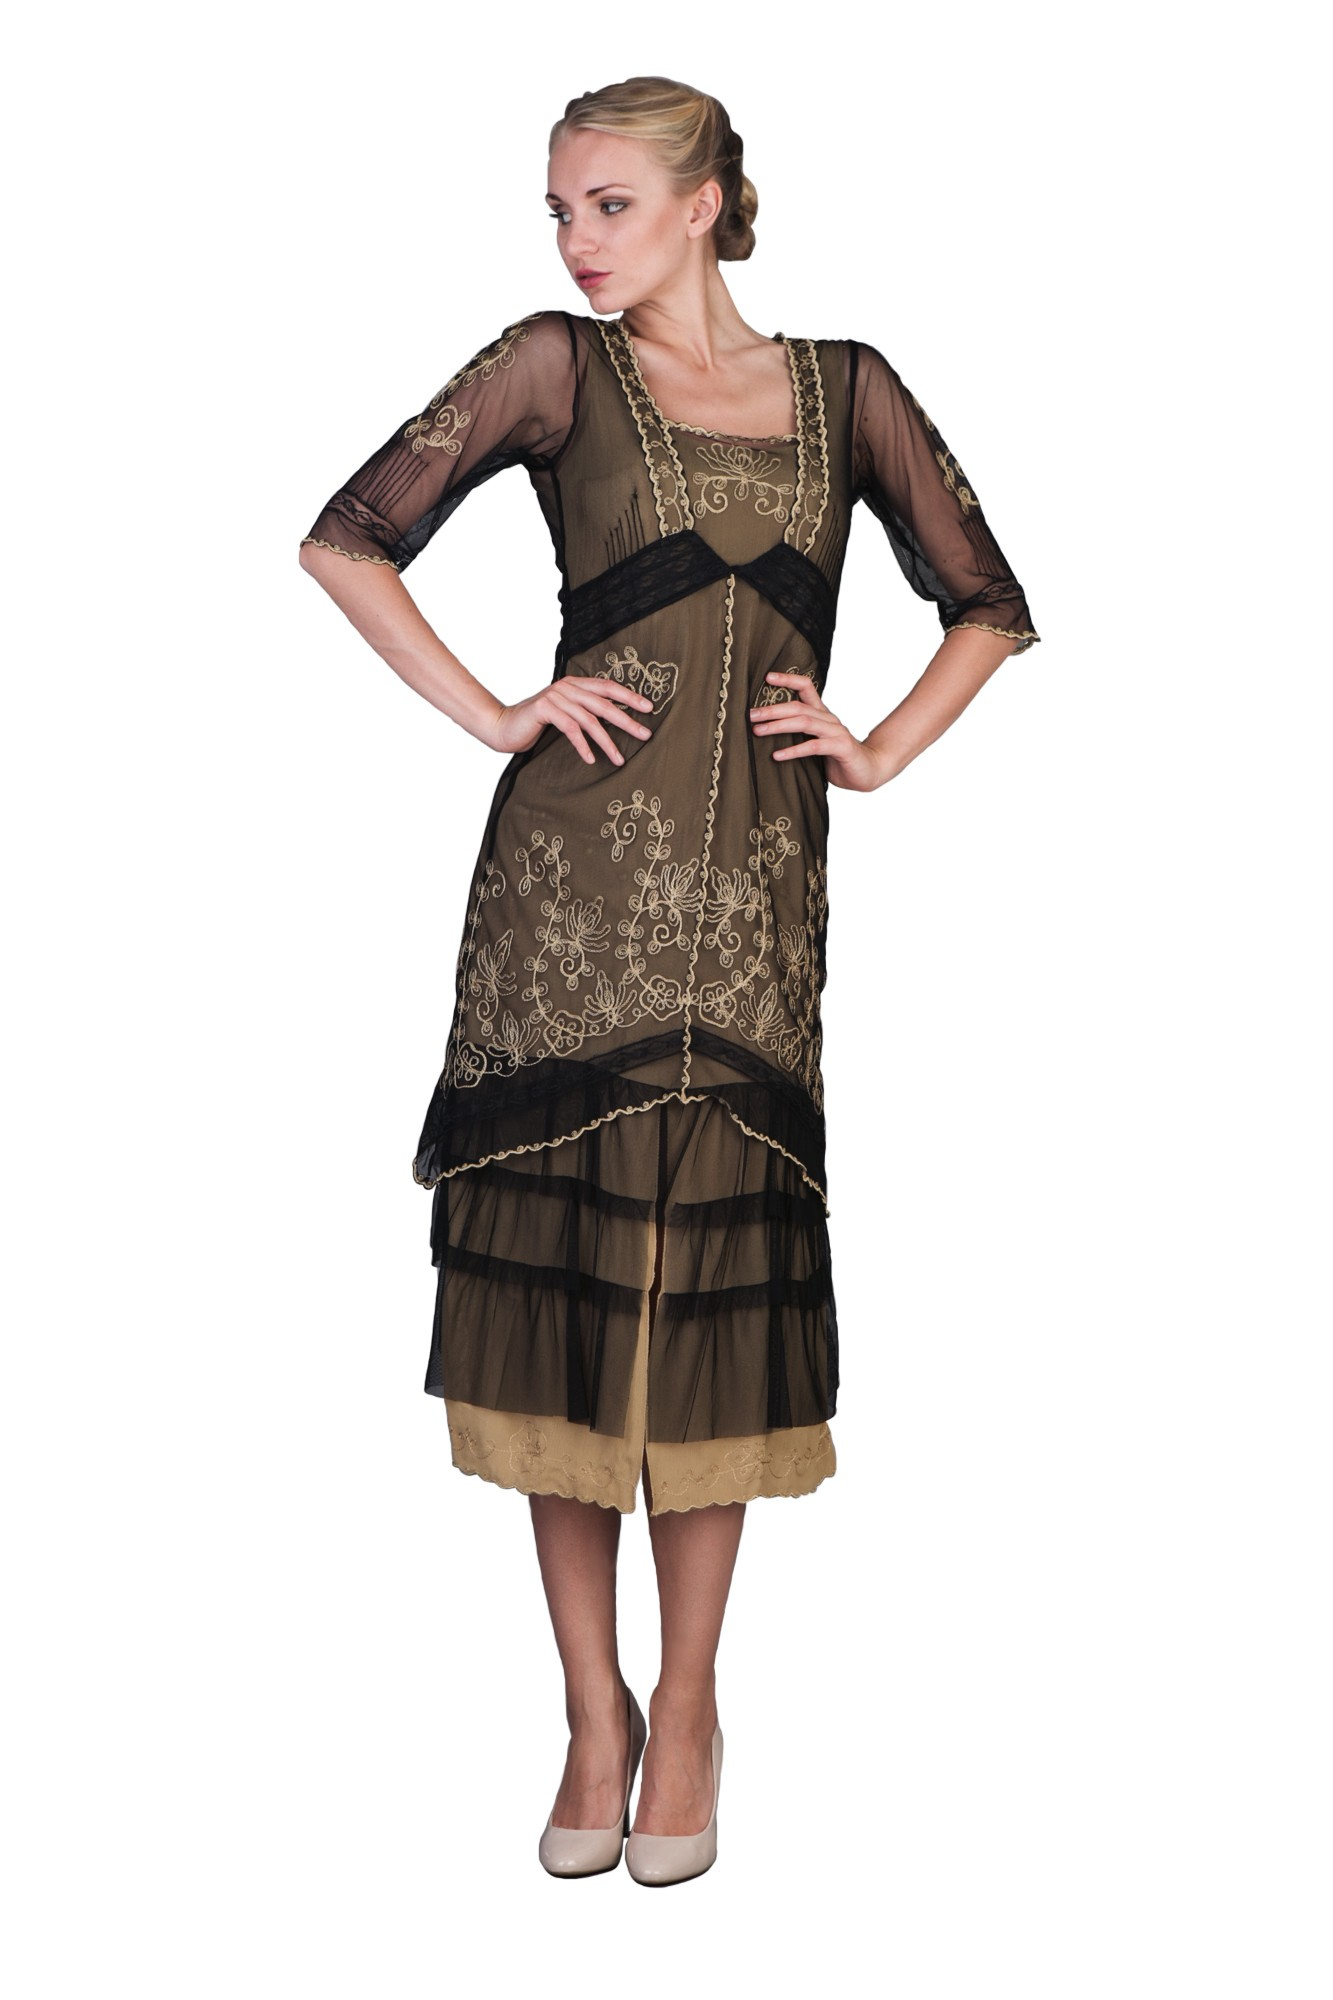 Titanic Tea Party Dress in Black Gold by Nataya